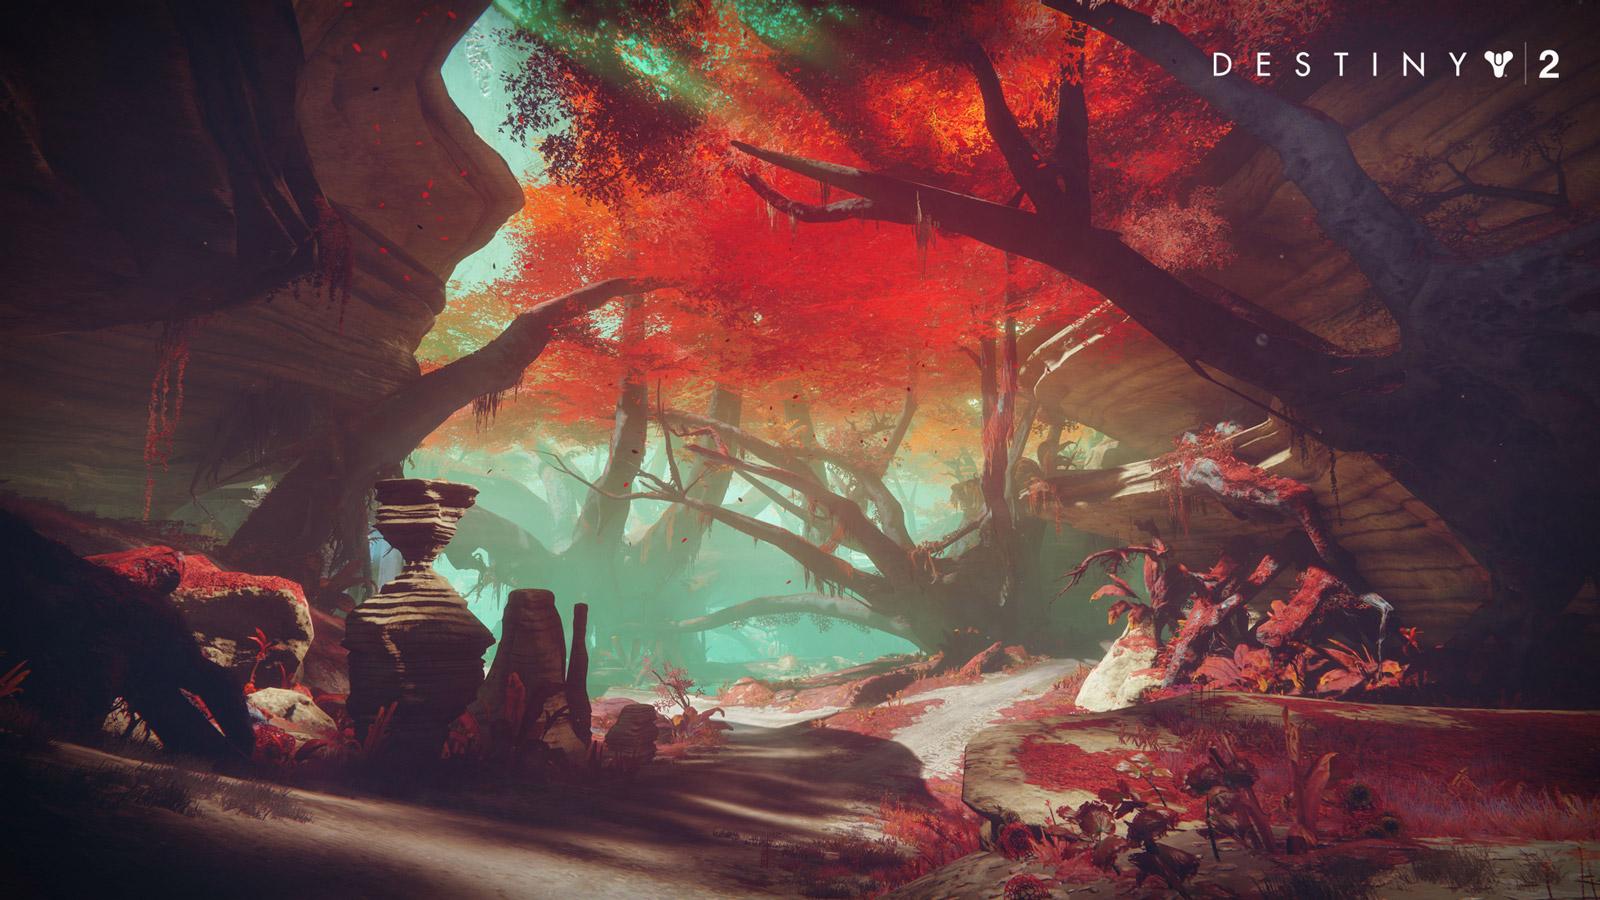 Destiny 2 Wallpaper in 1600x900